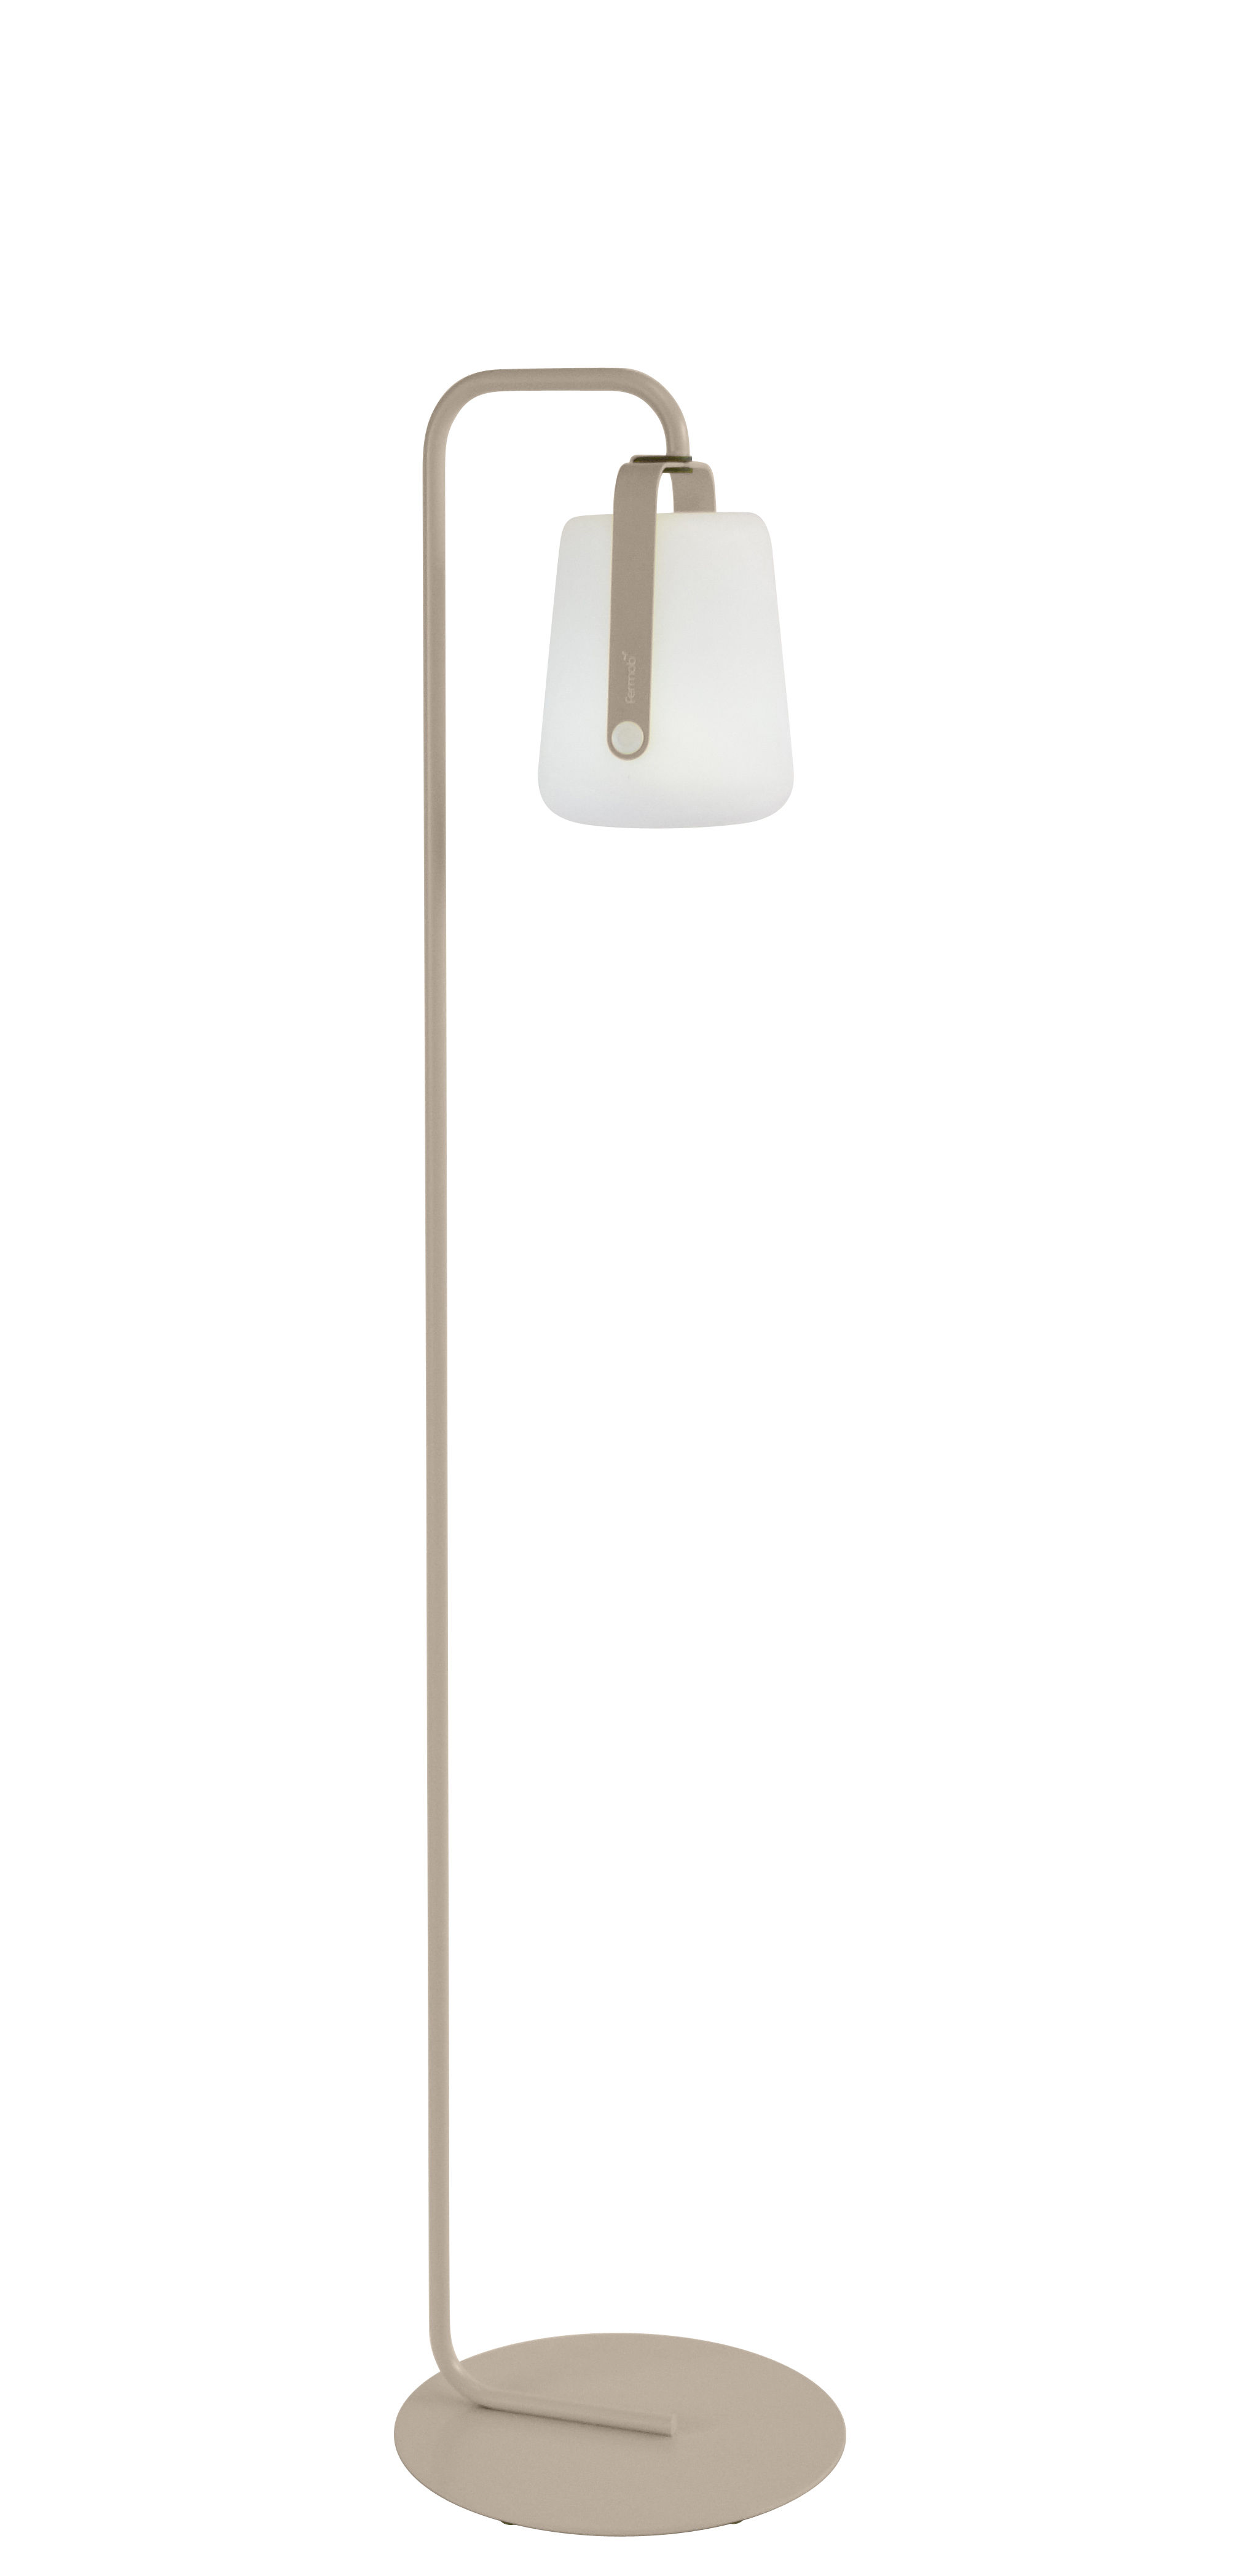 Luminaire - Lampadaires - Pied pour lampes Balad / Small H 157 cm - Fermob - Muscade - Acier